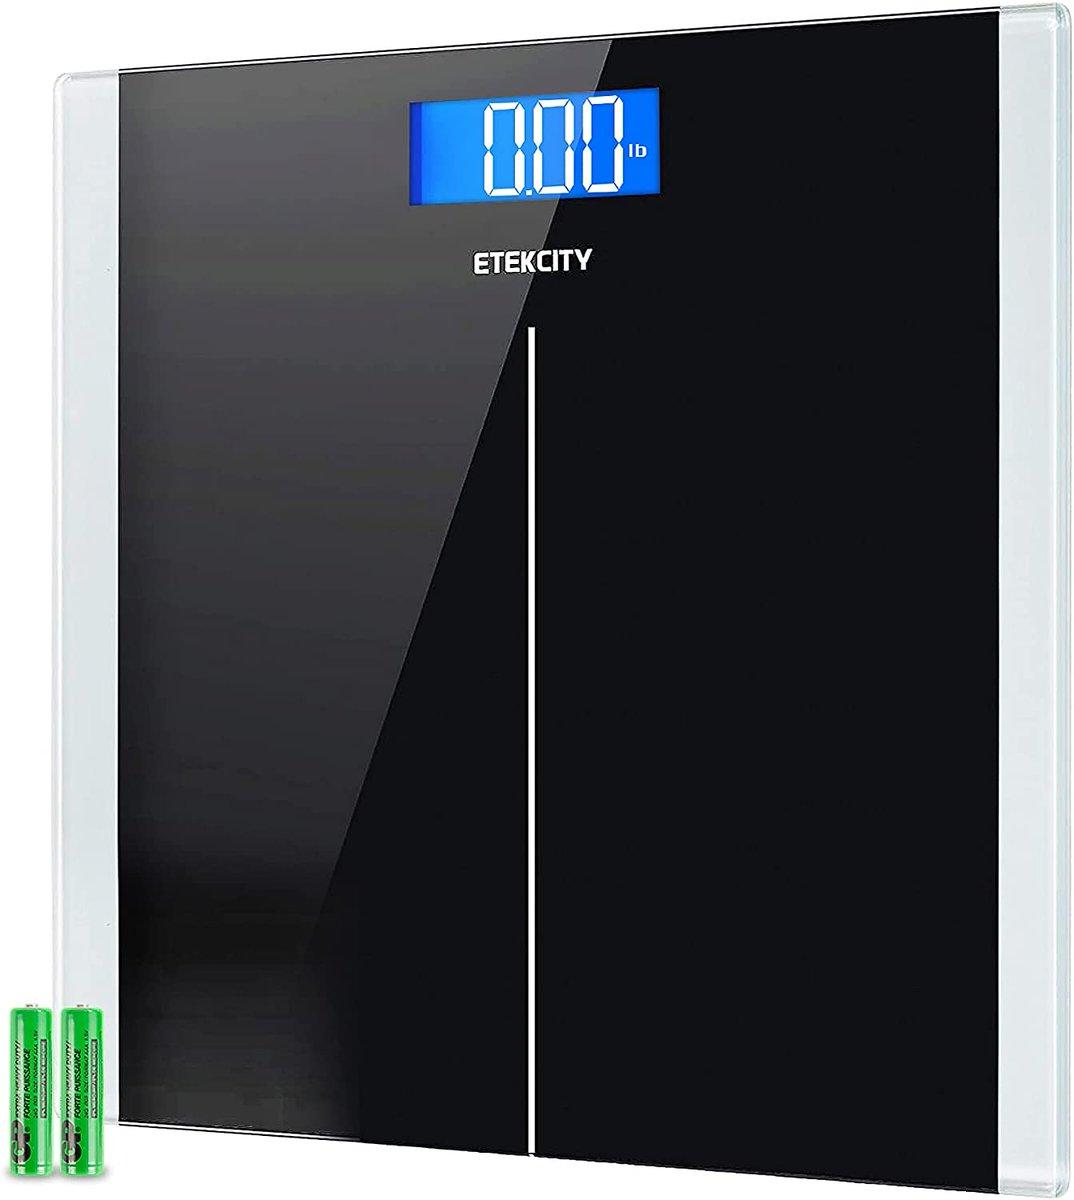 Etekcity Digital Body Weight Bathroom Scale   Only $16.99!